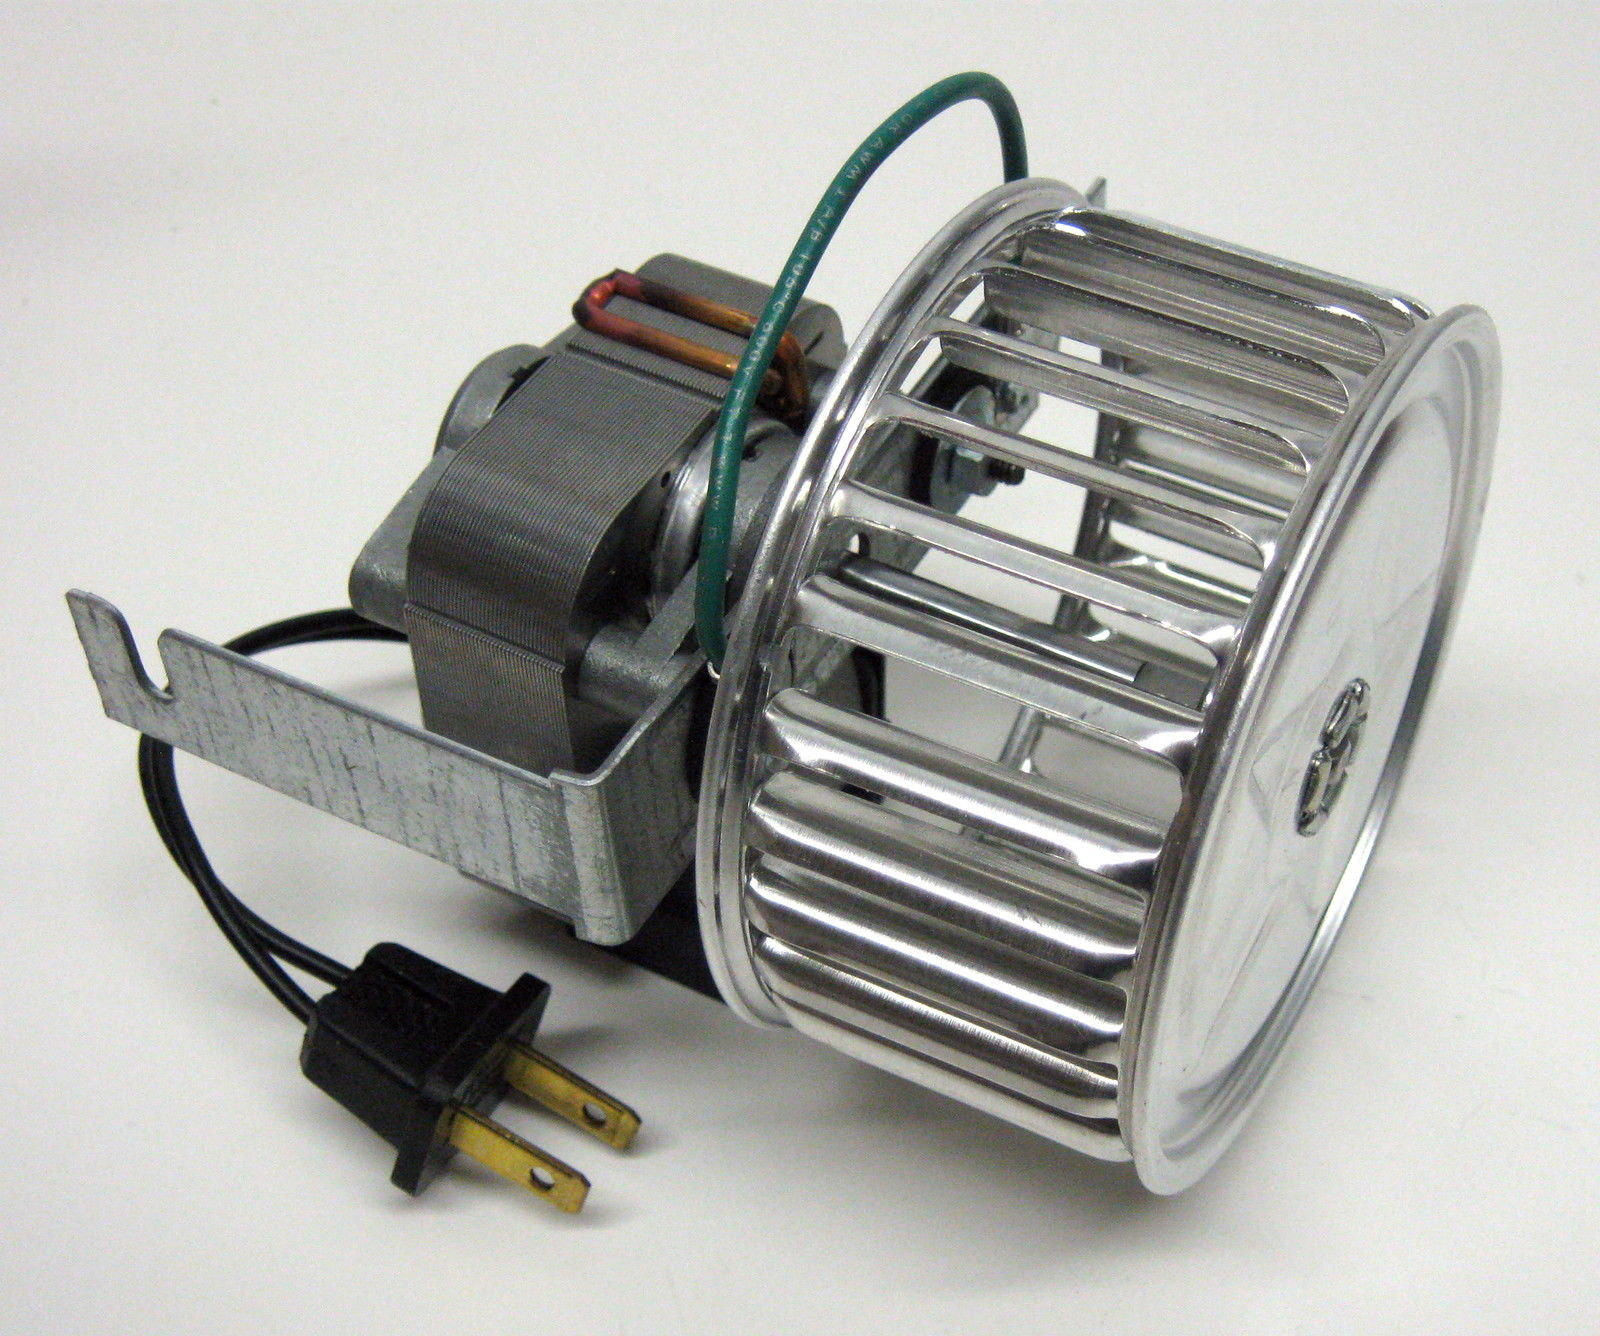 82229000 Nutone Broan Oem Vent Bath Fan Motor For Model 9415 C 82230 Walmart Com Walmart Com